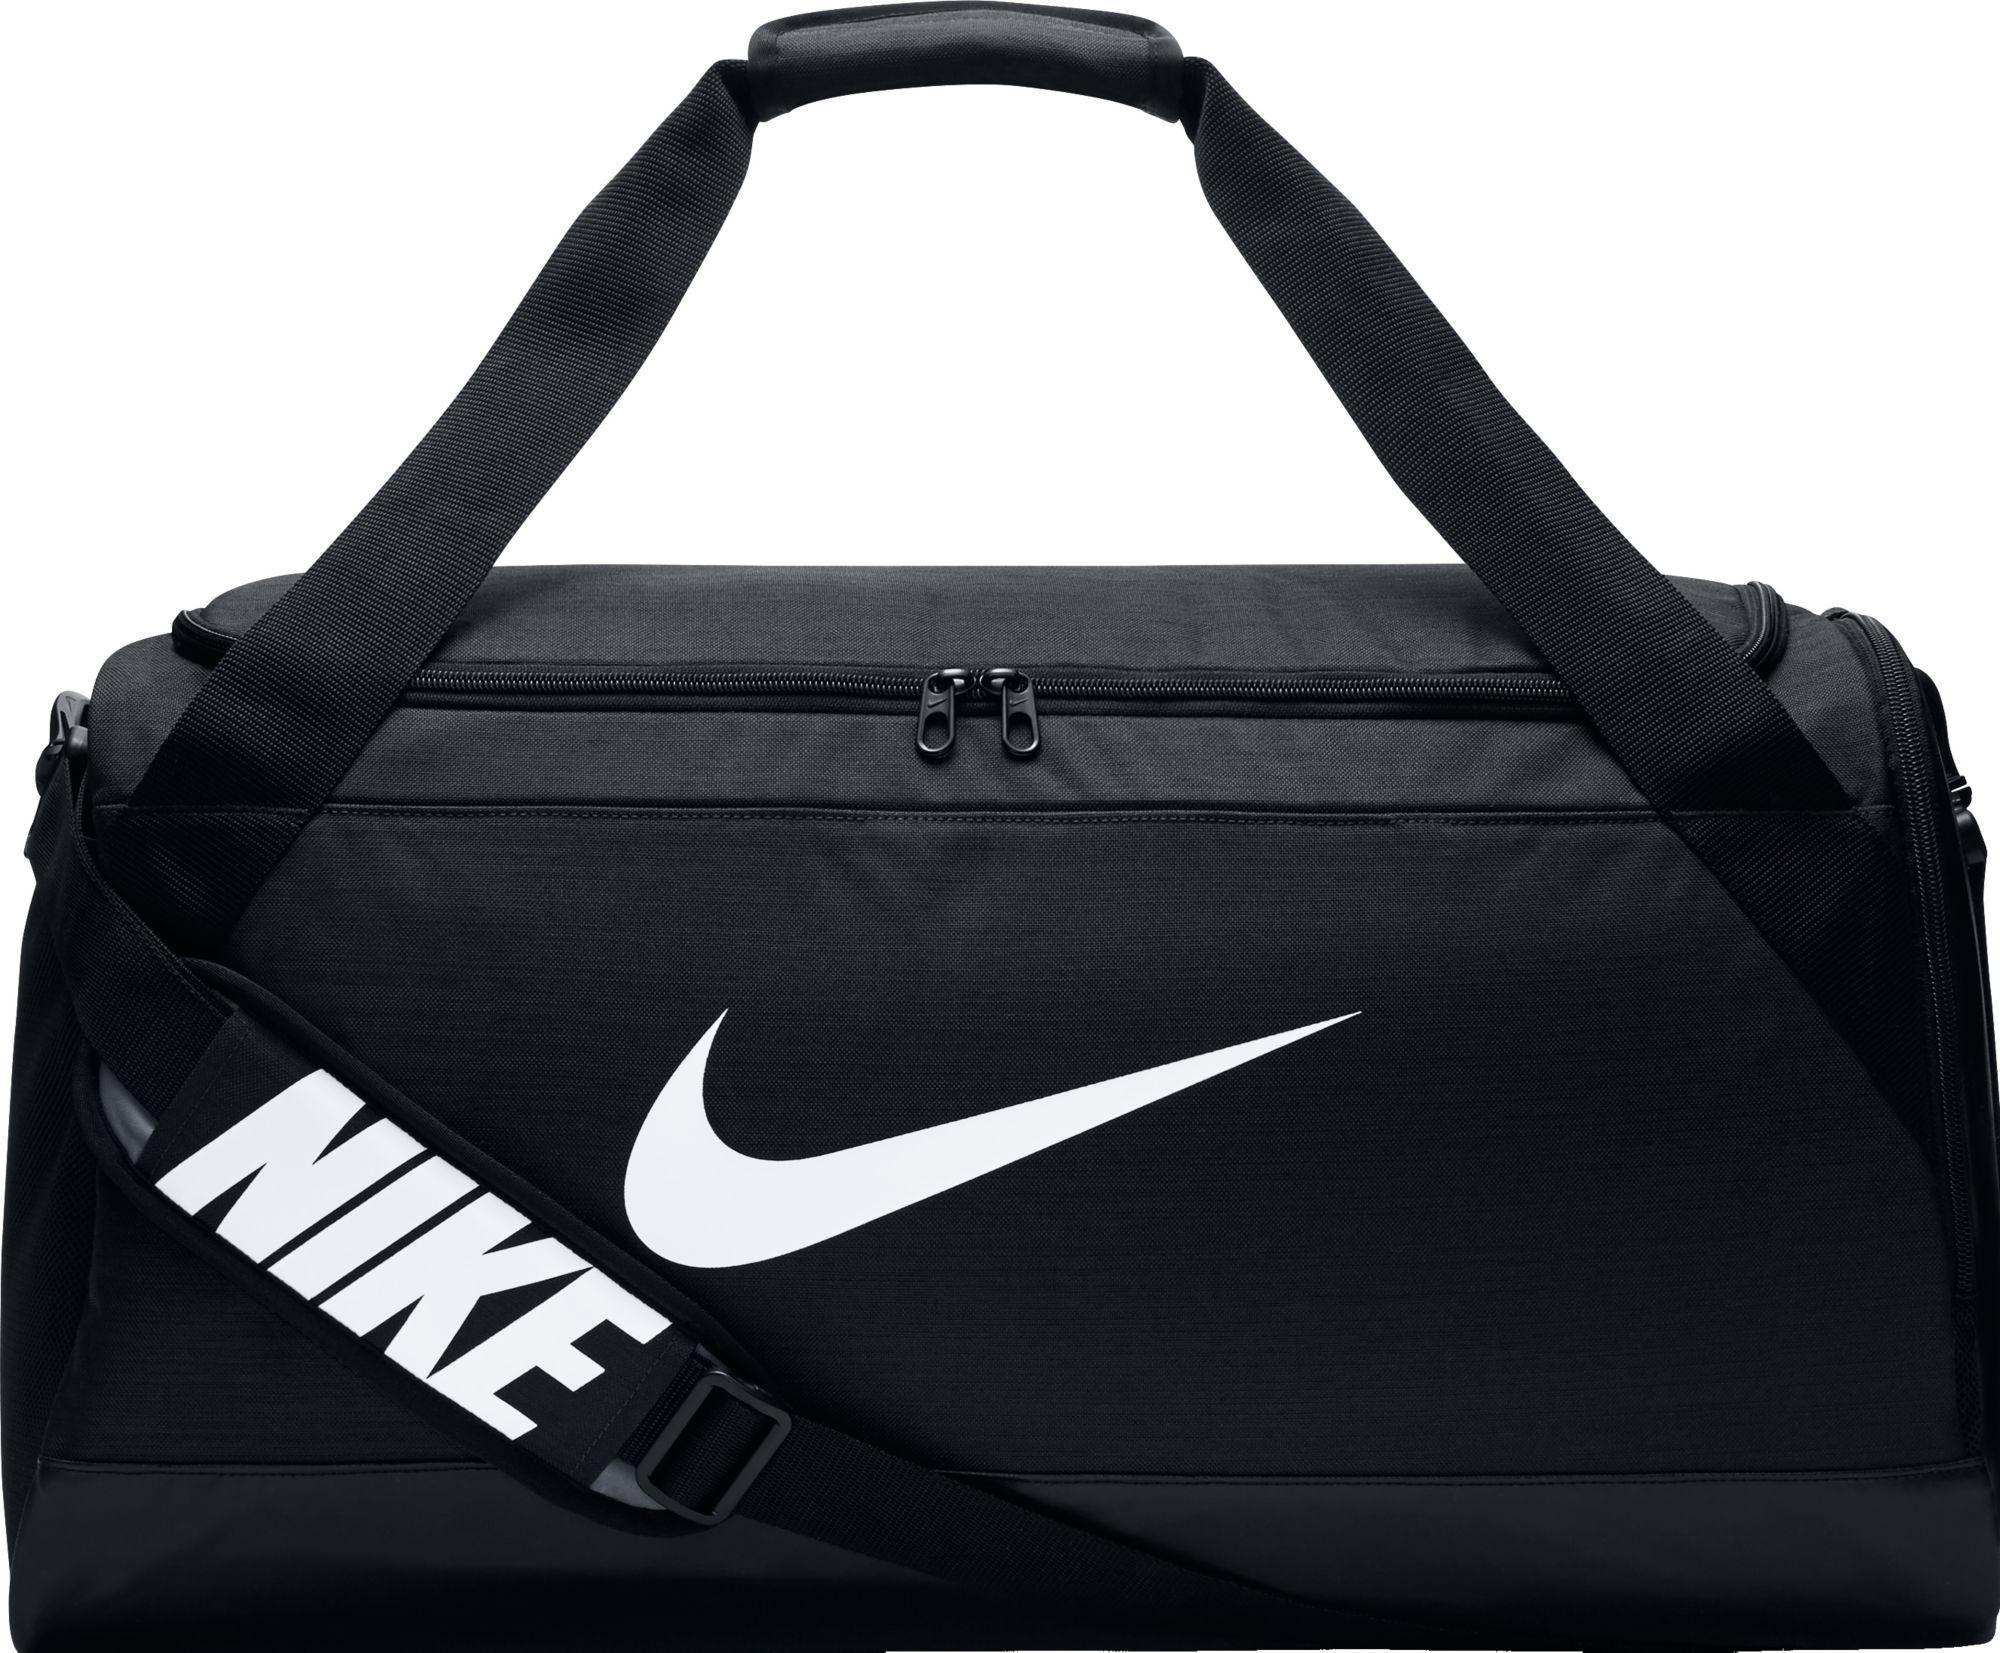 202fc28f4c4d Lyst - Nike Rasilia Medium Training Duffle Bag in Black for Men